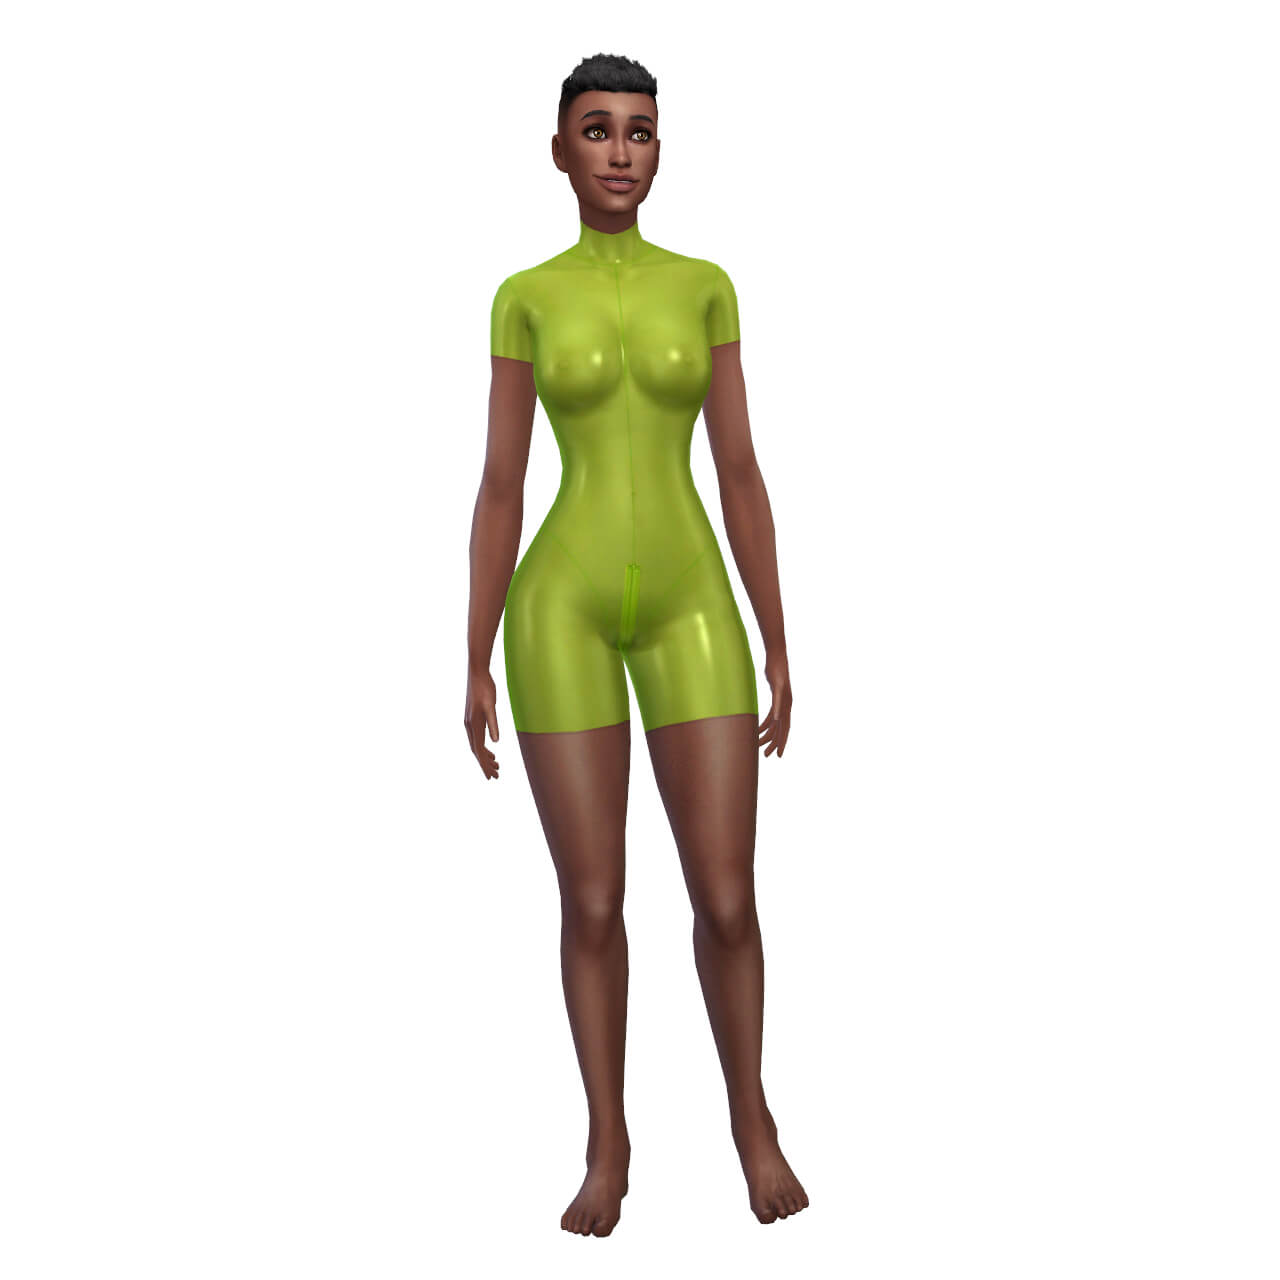 Latex Singlet 10 Bodysuit with Zipper